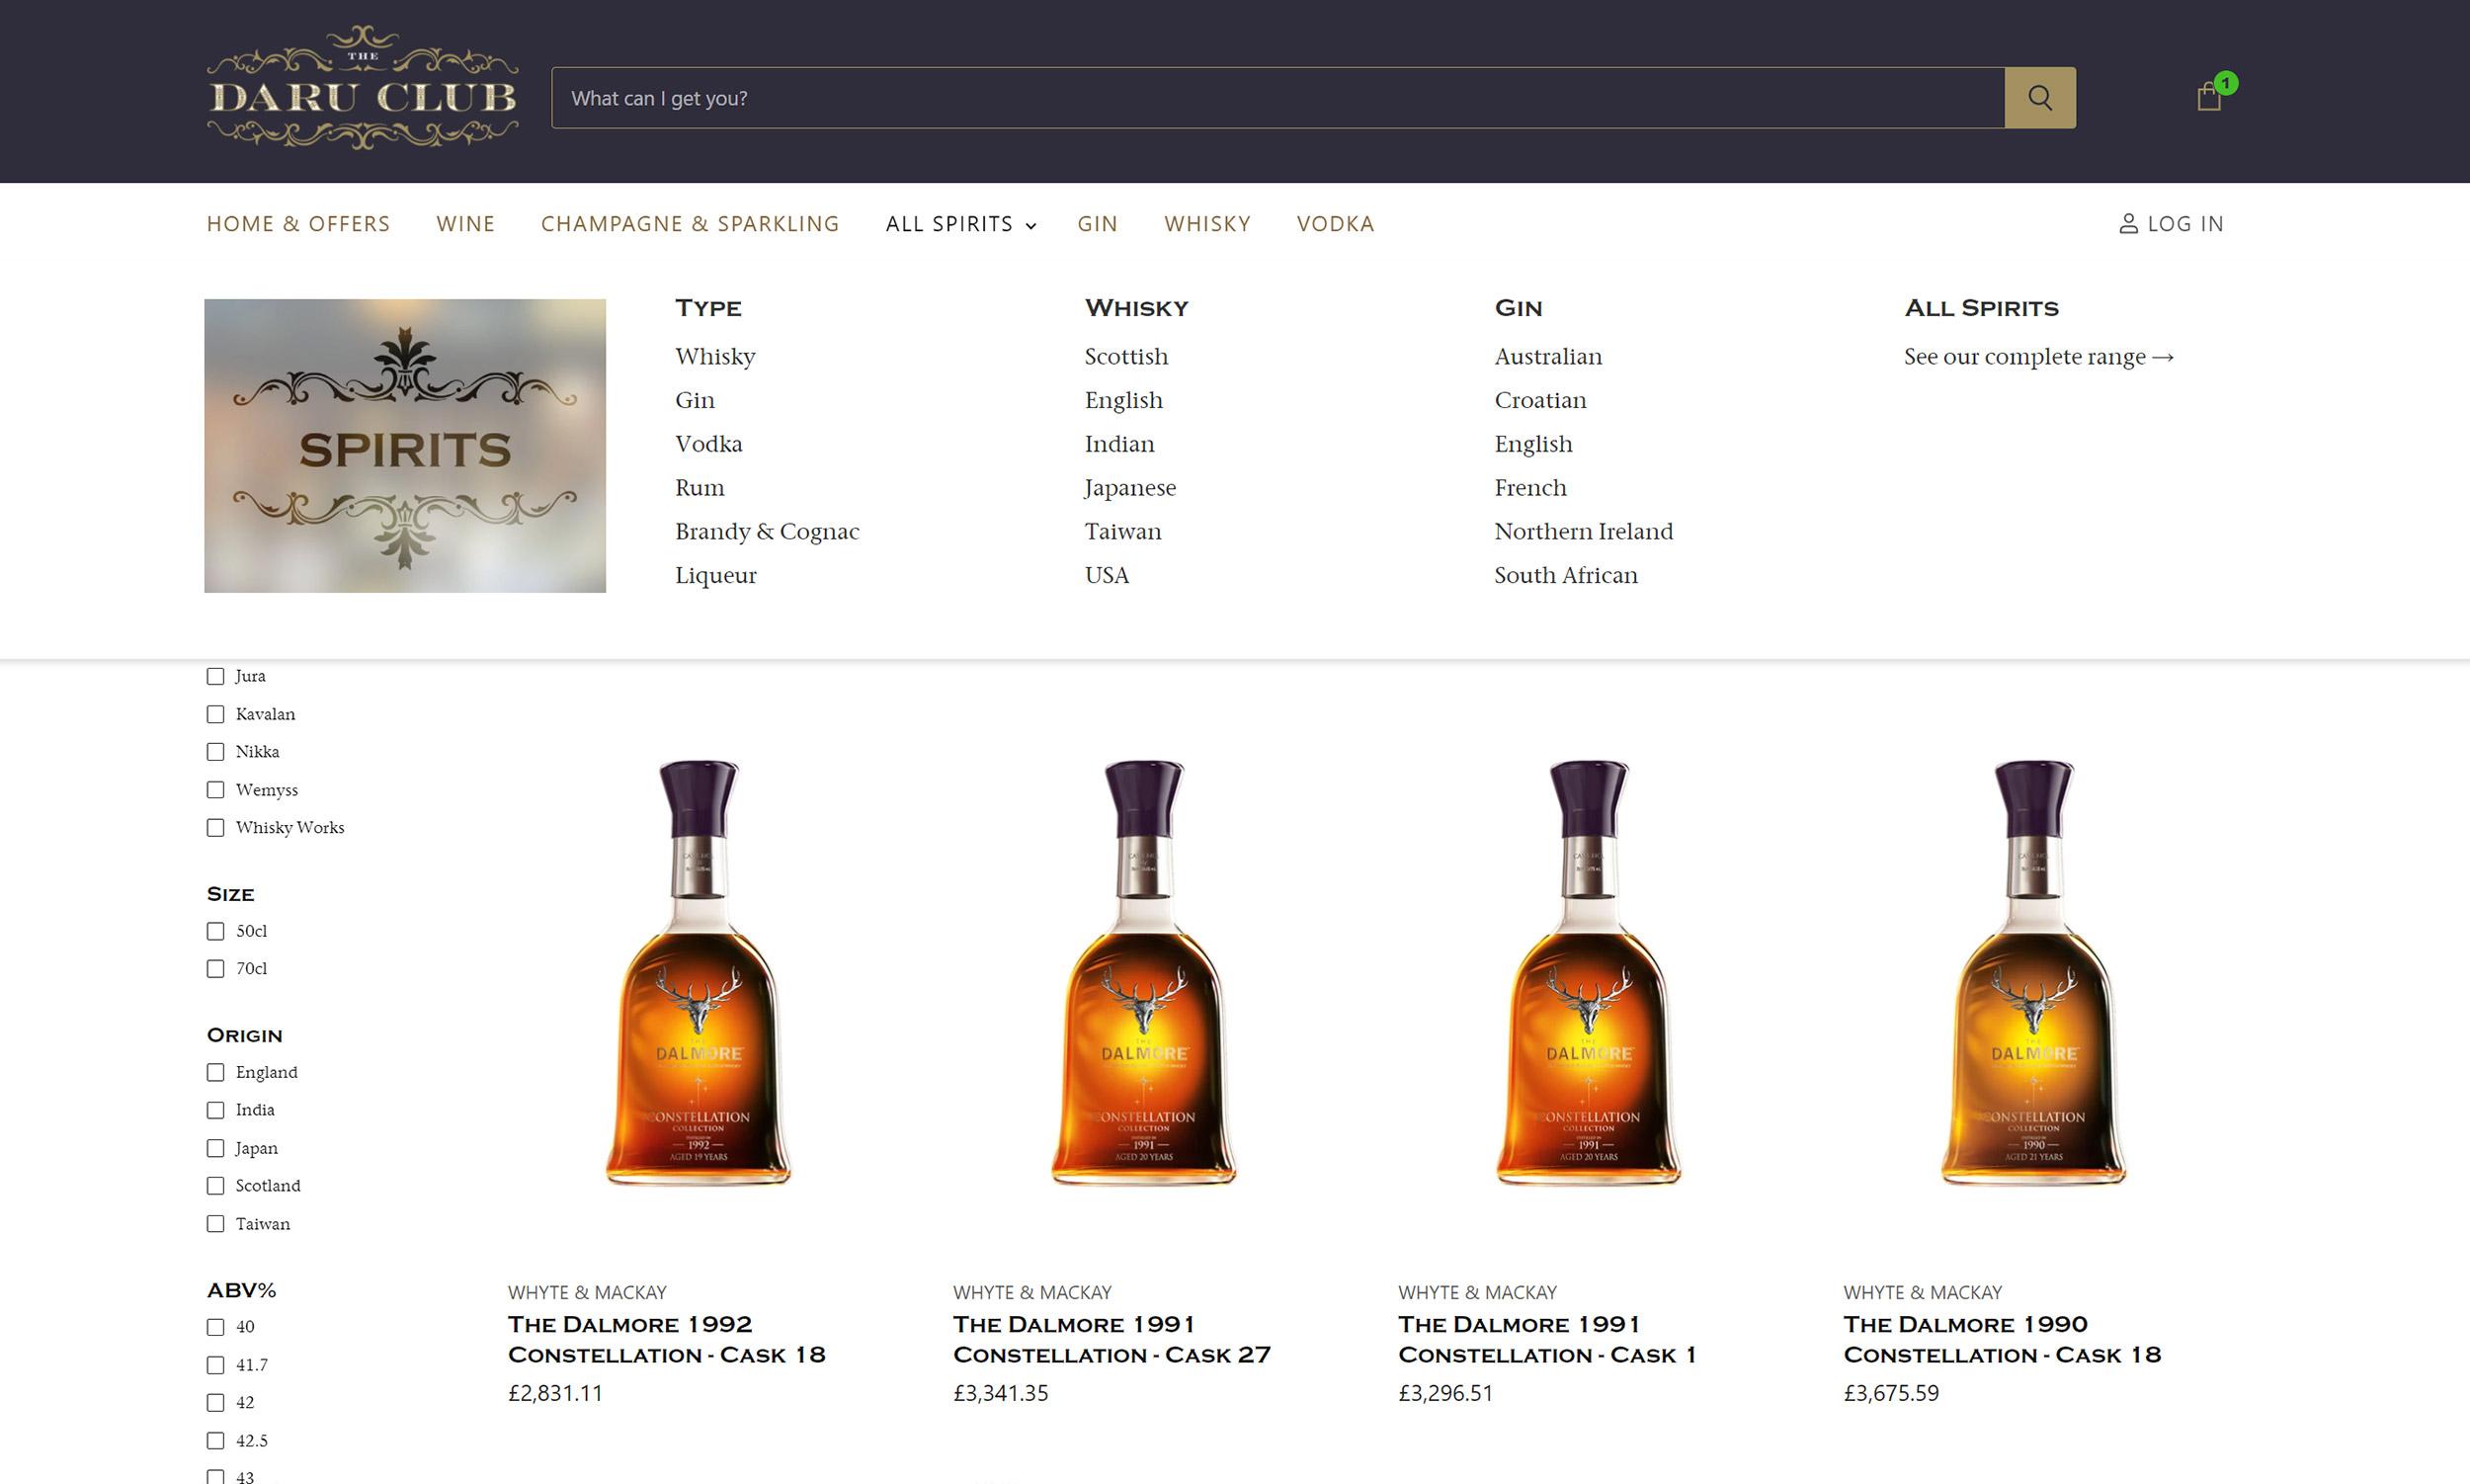 ecommerce-website-design-daru3-farnborough-DGTL